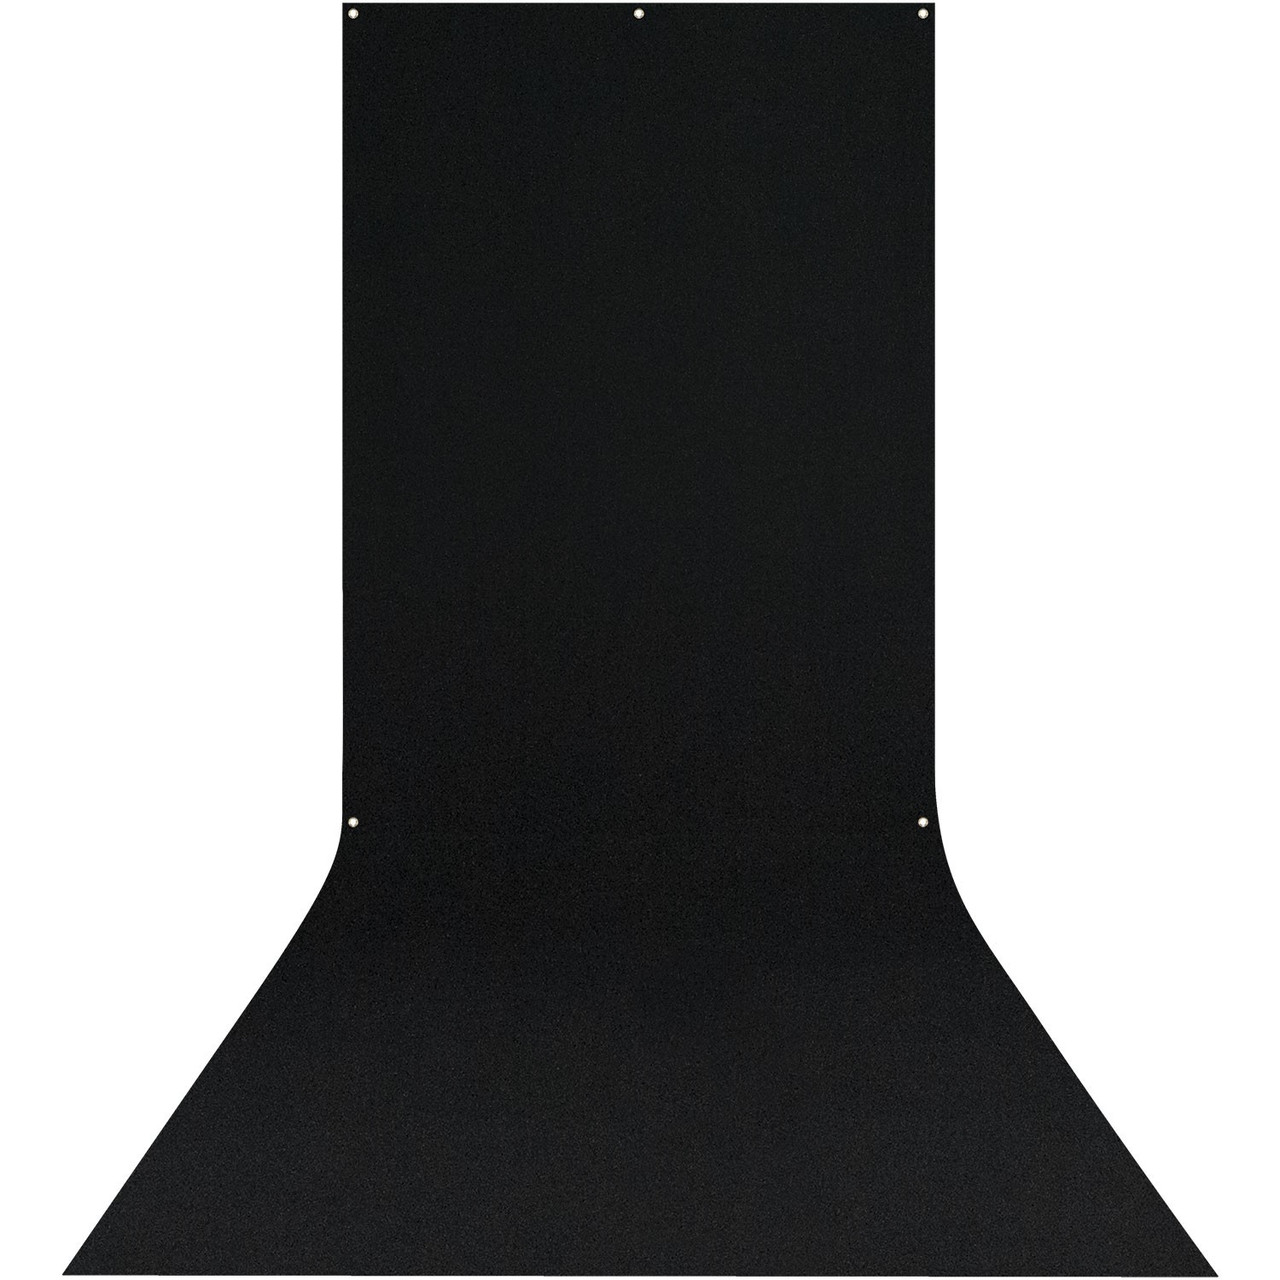 Westcott X-Drop Wrinkle-Resistant Backdrop Sweep - 5' x 12' (Black)